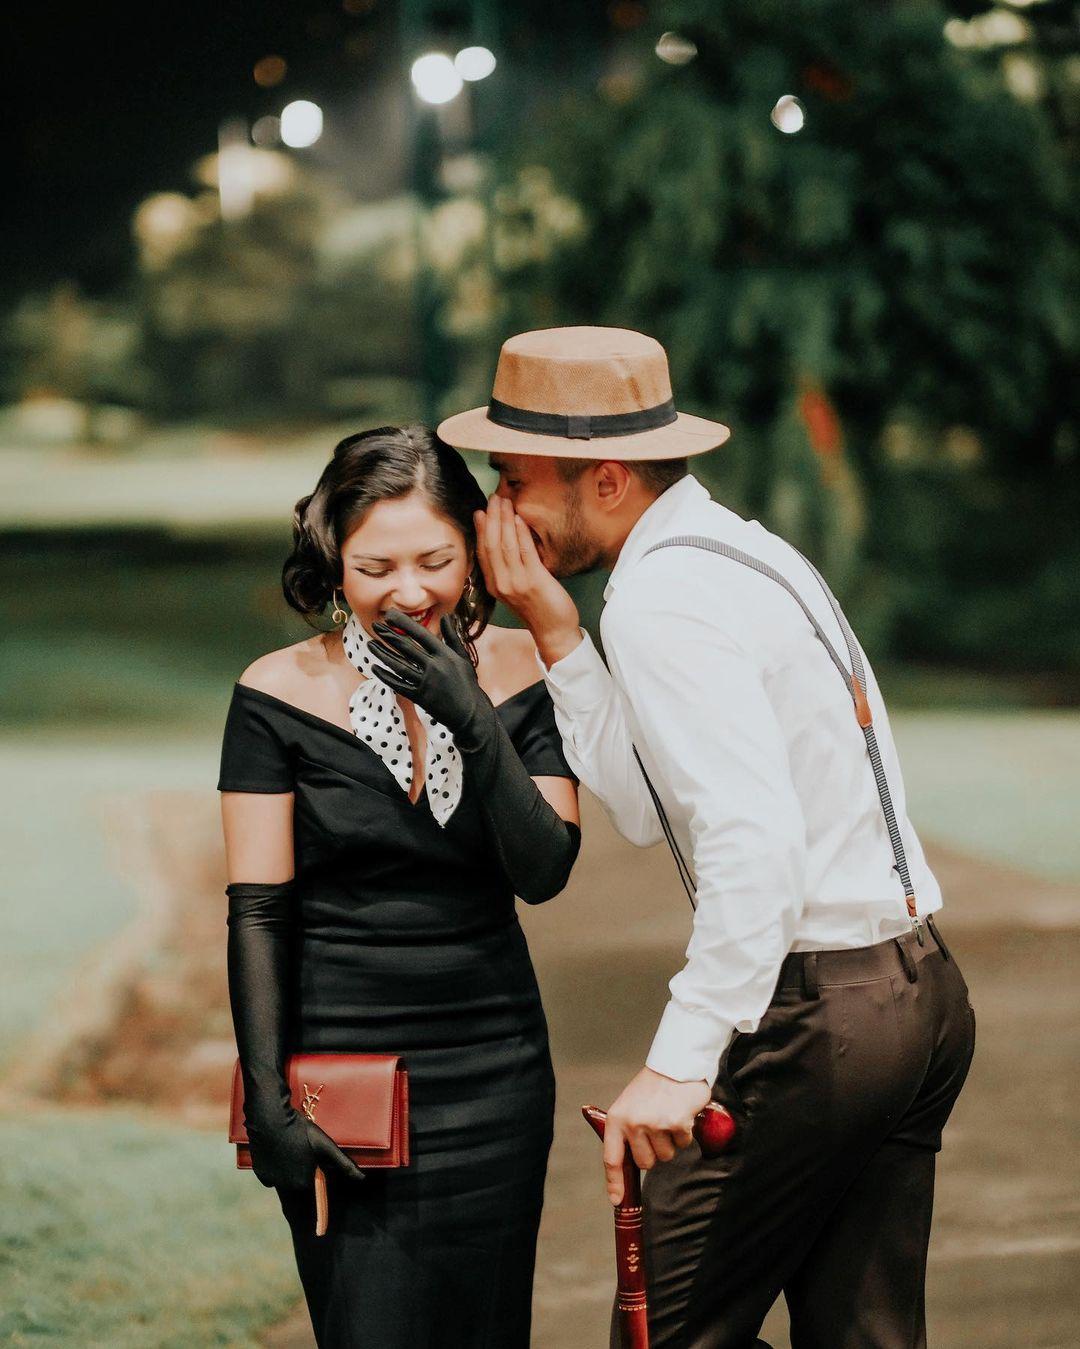 Bikin Baper, 7 Potret Romantis Jessica Mila dan Yakup Hasibuan - Foto 1